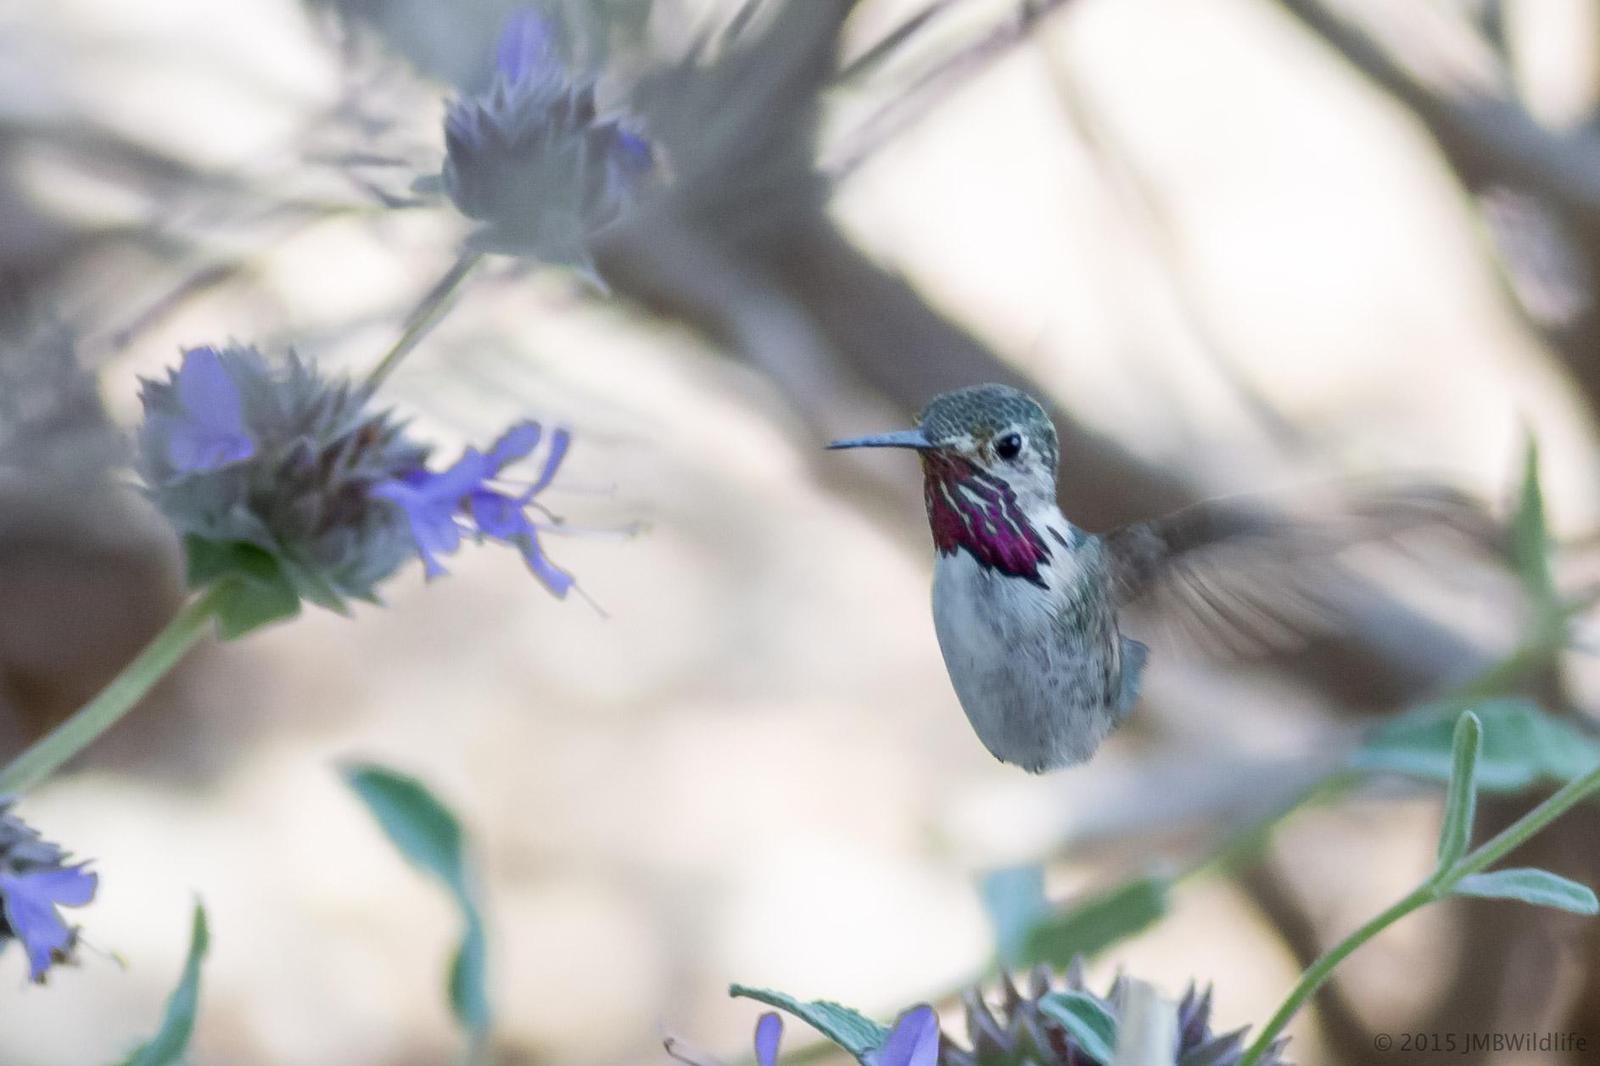 Calliope Hummingbird Photo by Jeff Bray